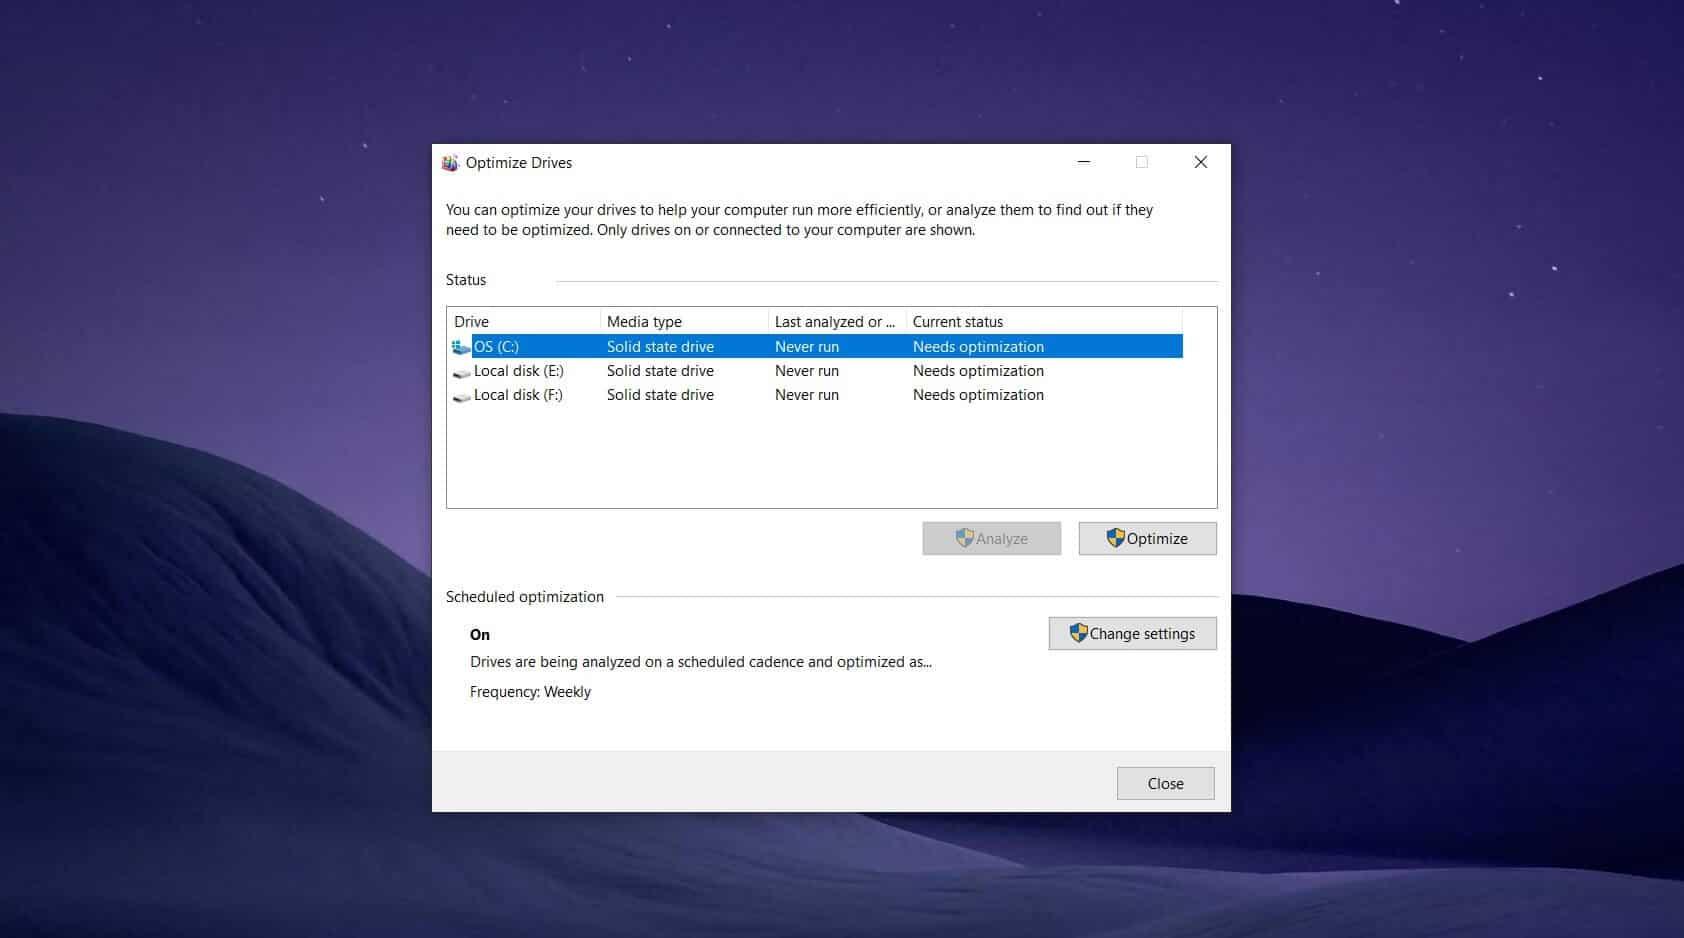 Windows 10 Build 19041.488